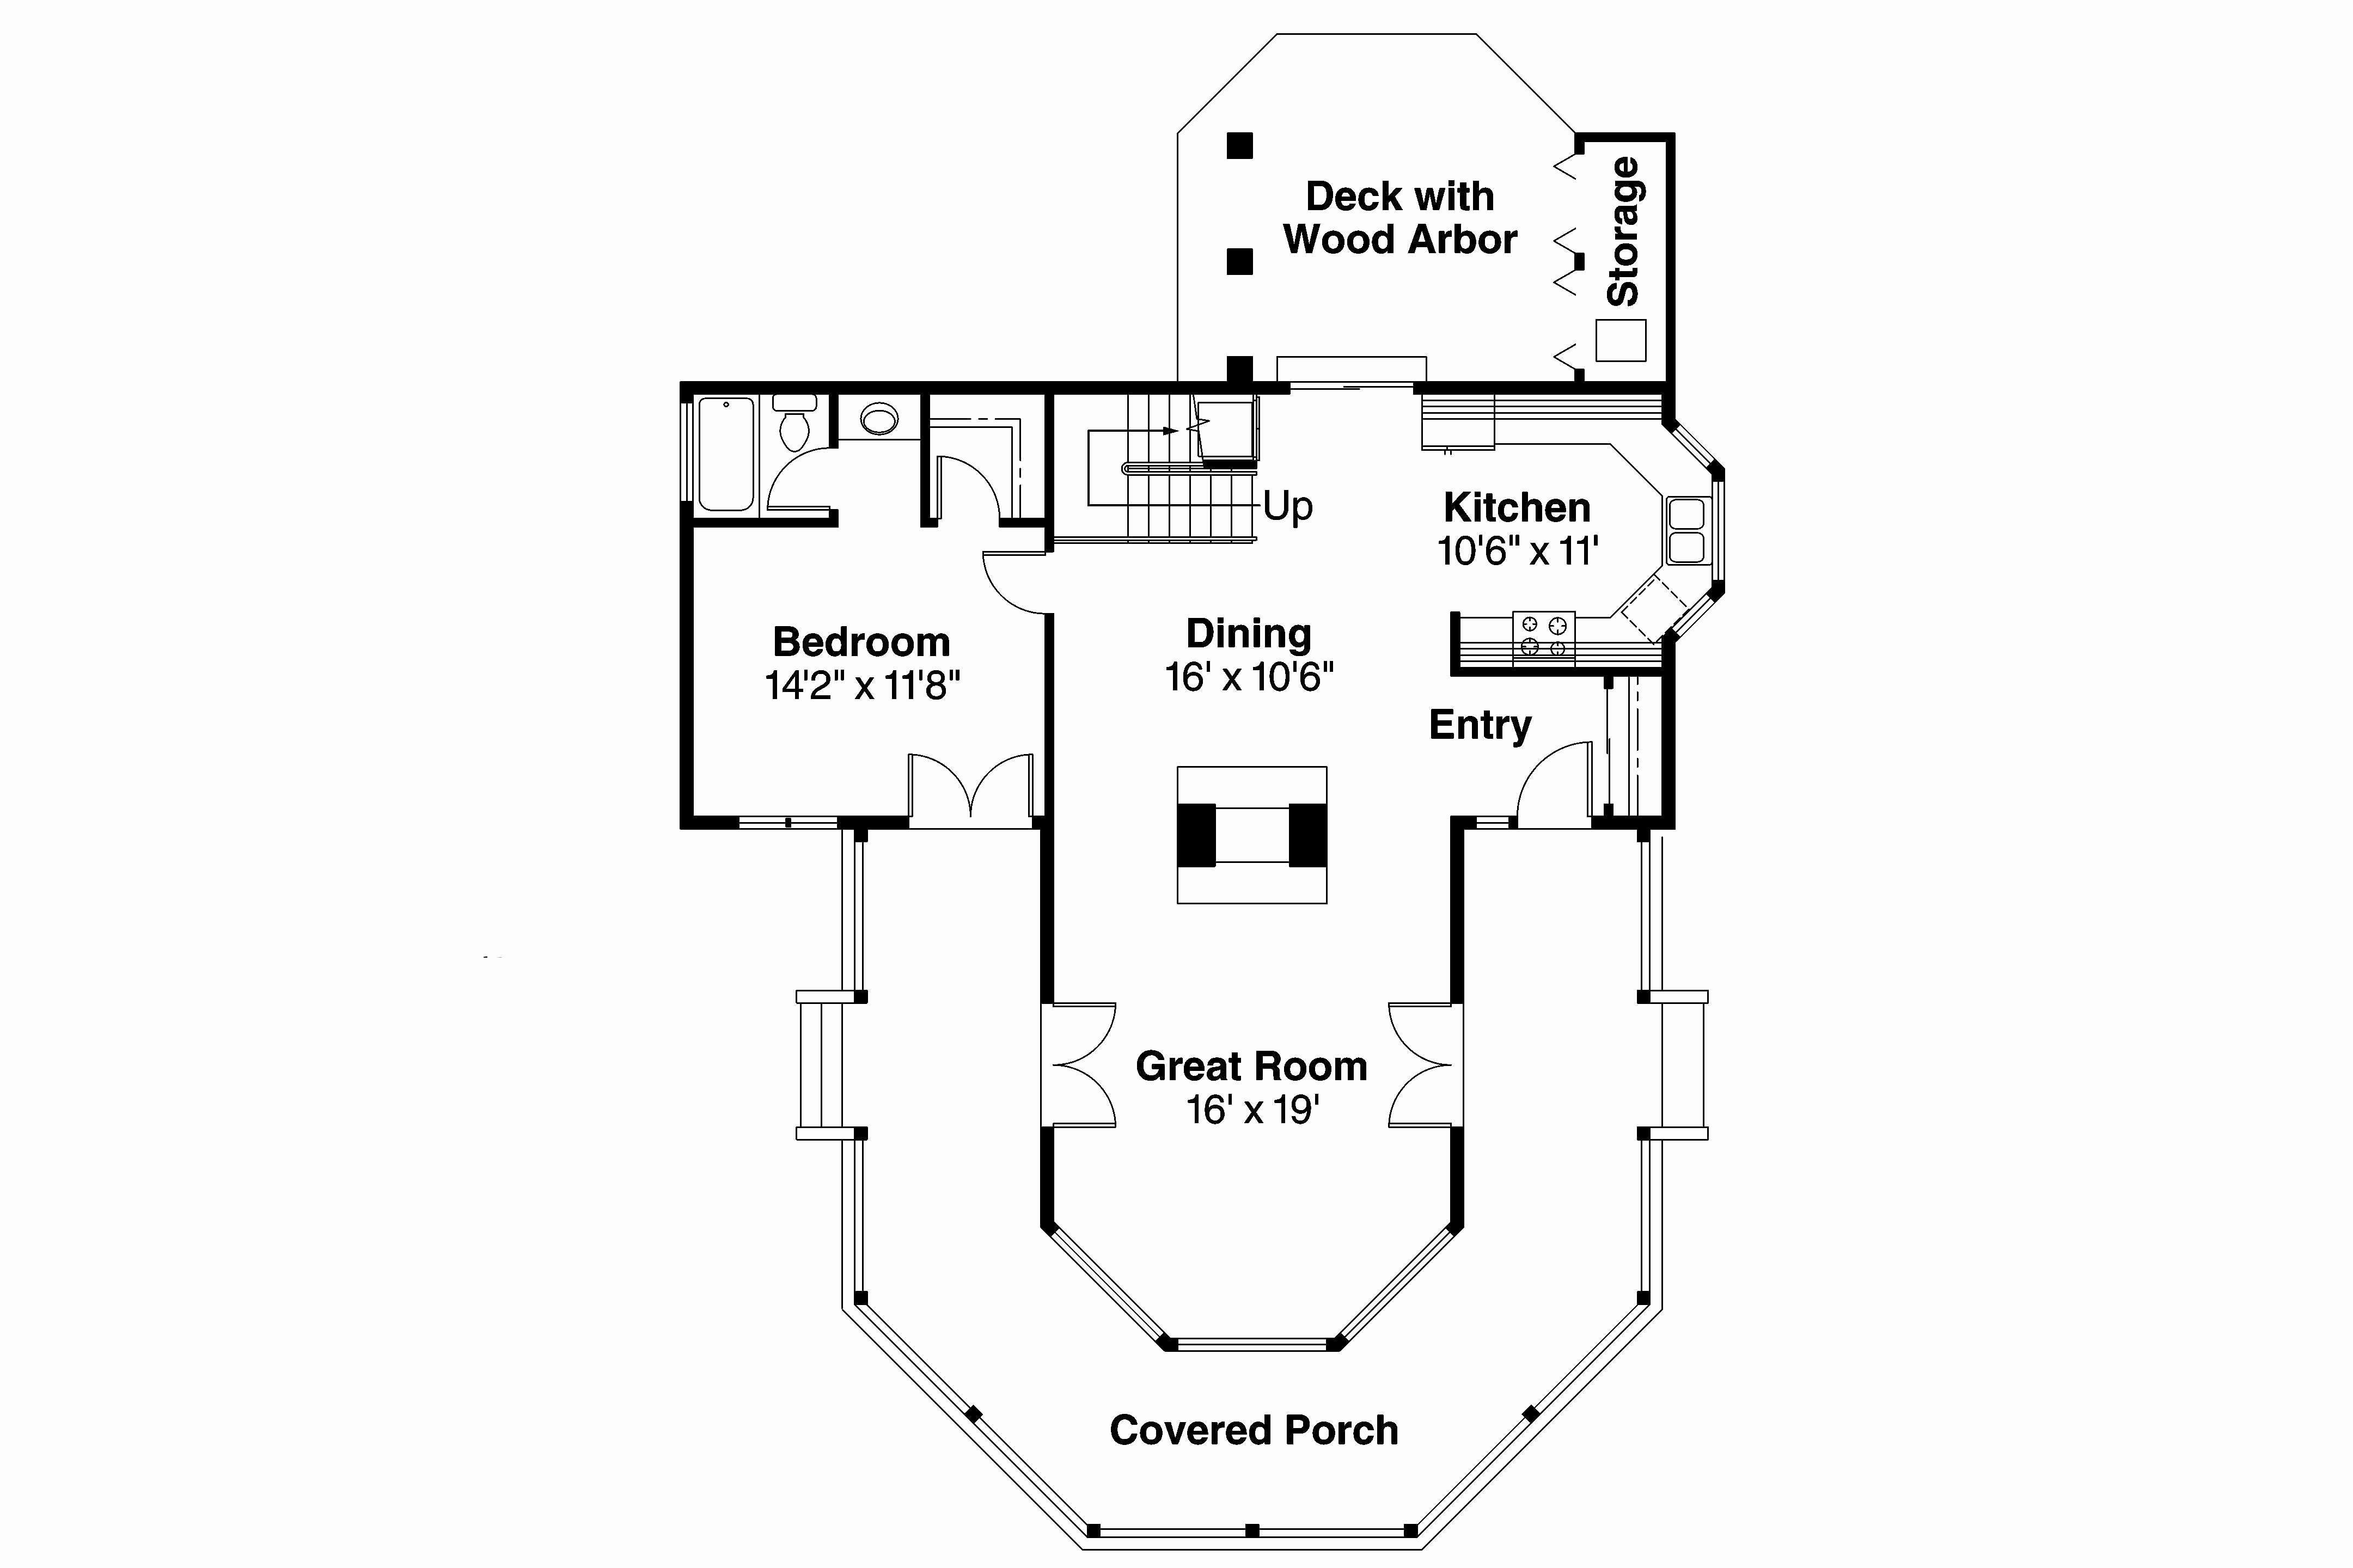 planning hardwood floor layout of 84 lumber home plans 84 lumber house plans barn home floor plans inside 84 lumber home plans 84 lumber pergola kit fresh 23 inspirational a frame floor plans